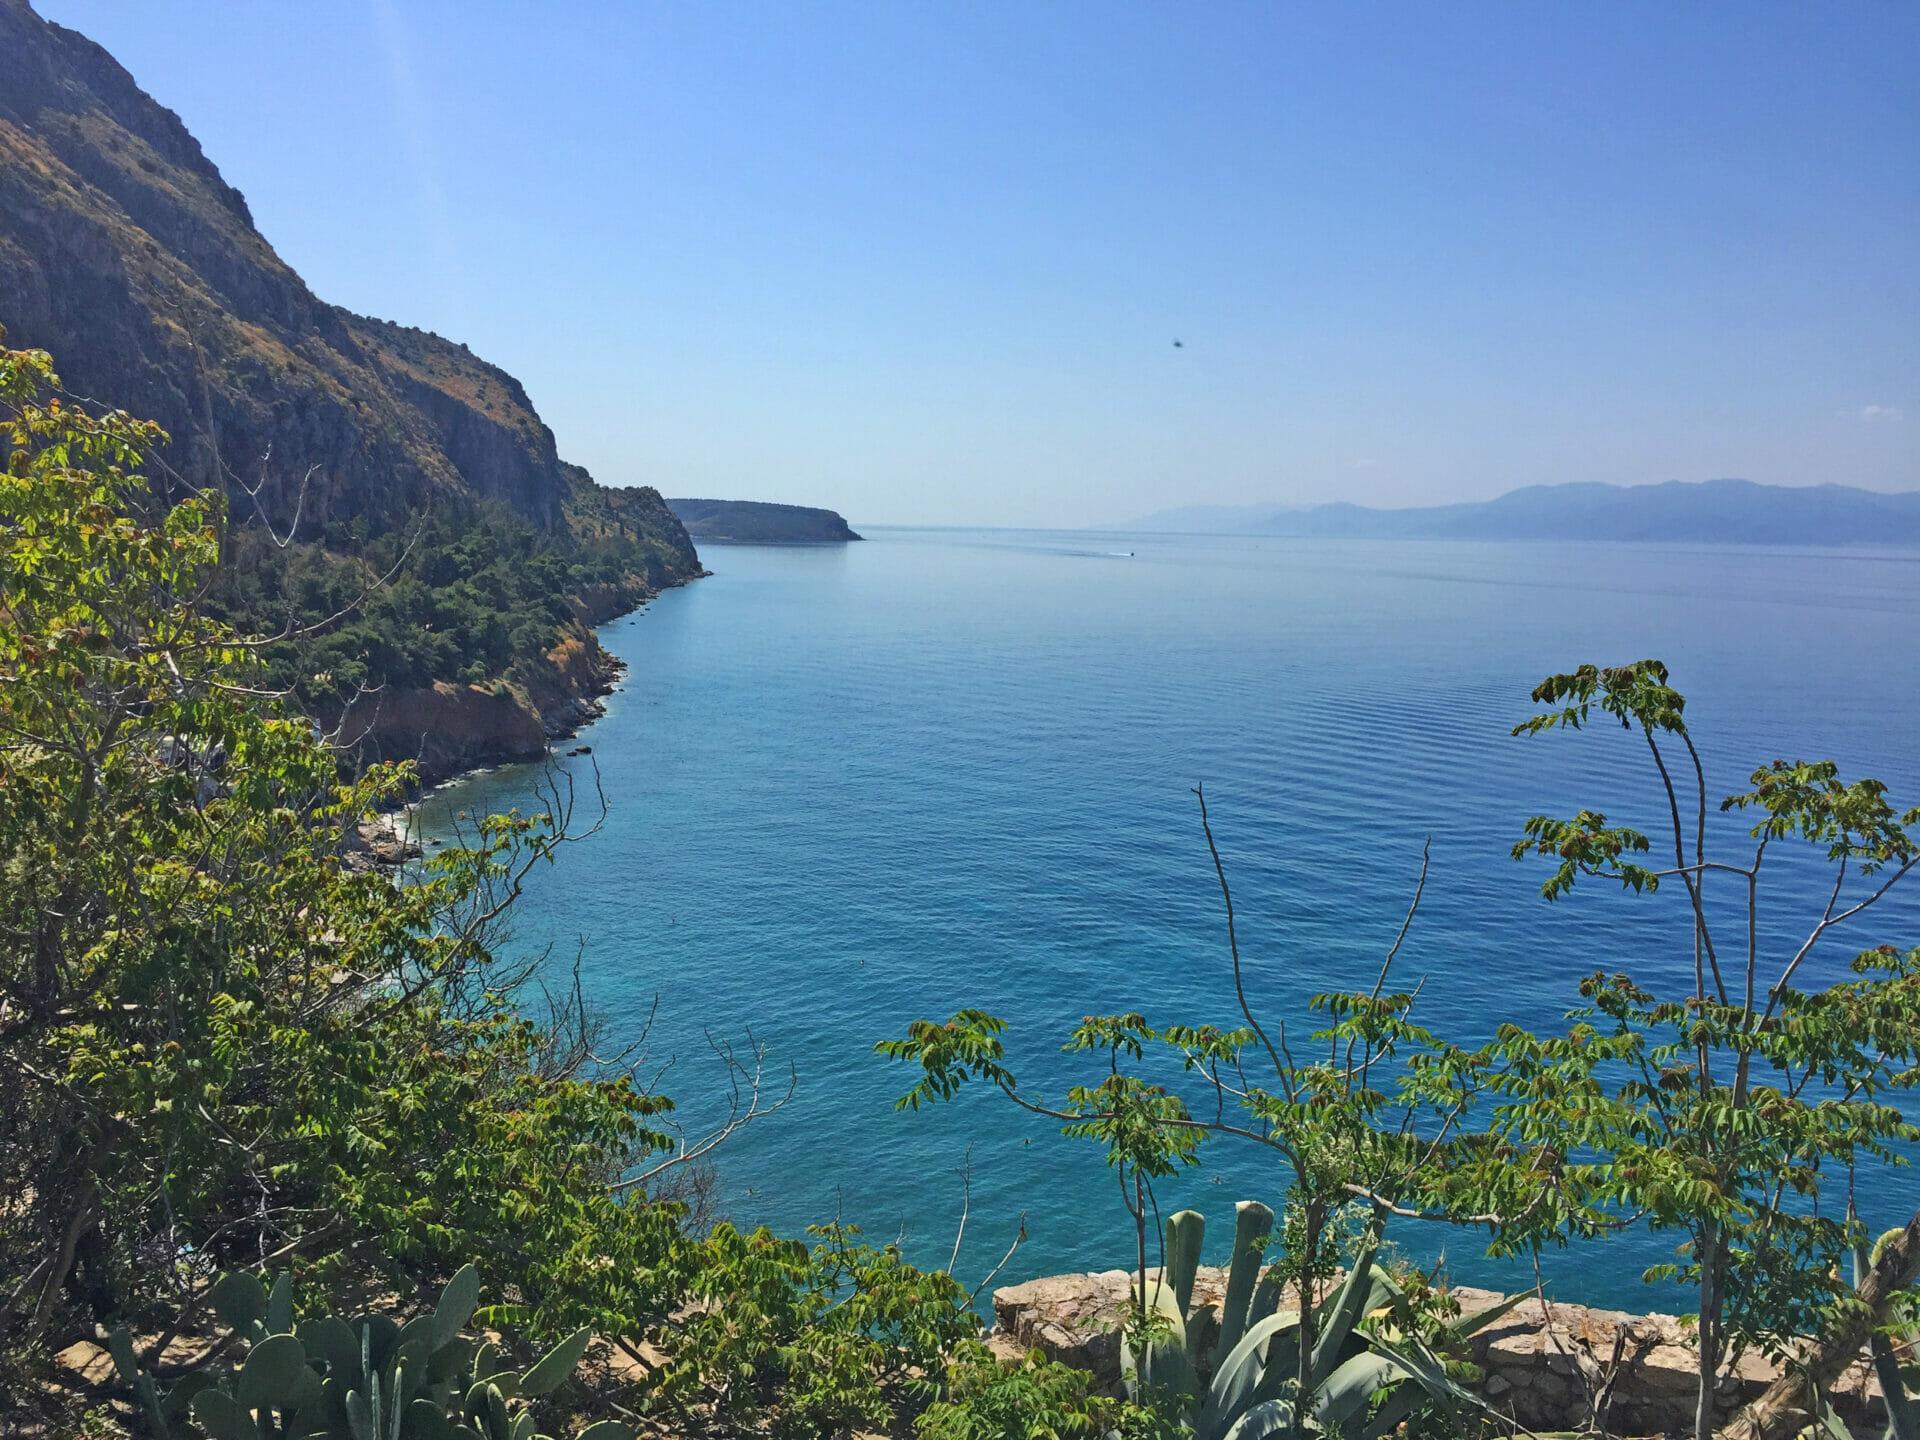 Nafplio view over the Pelopones